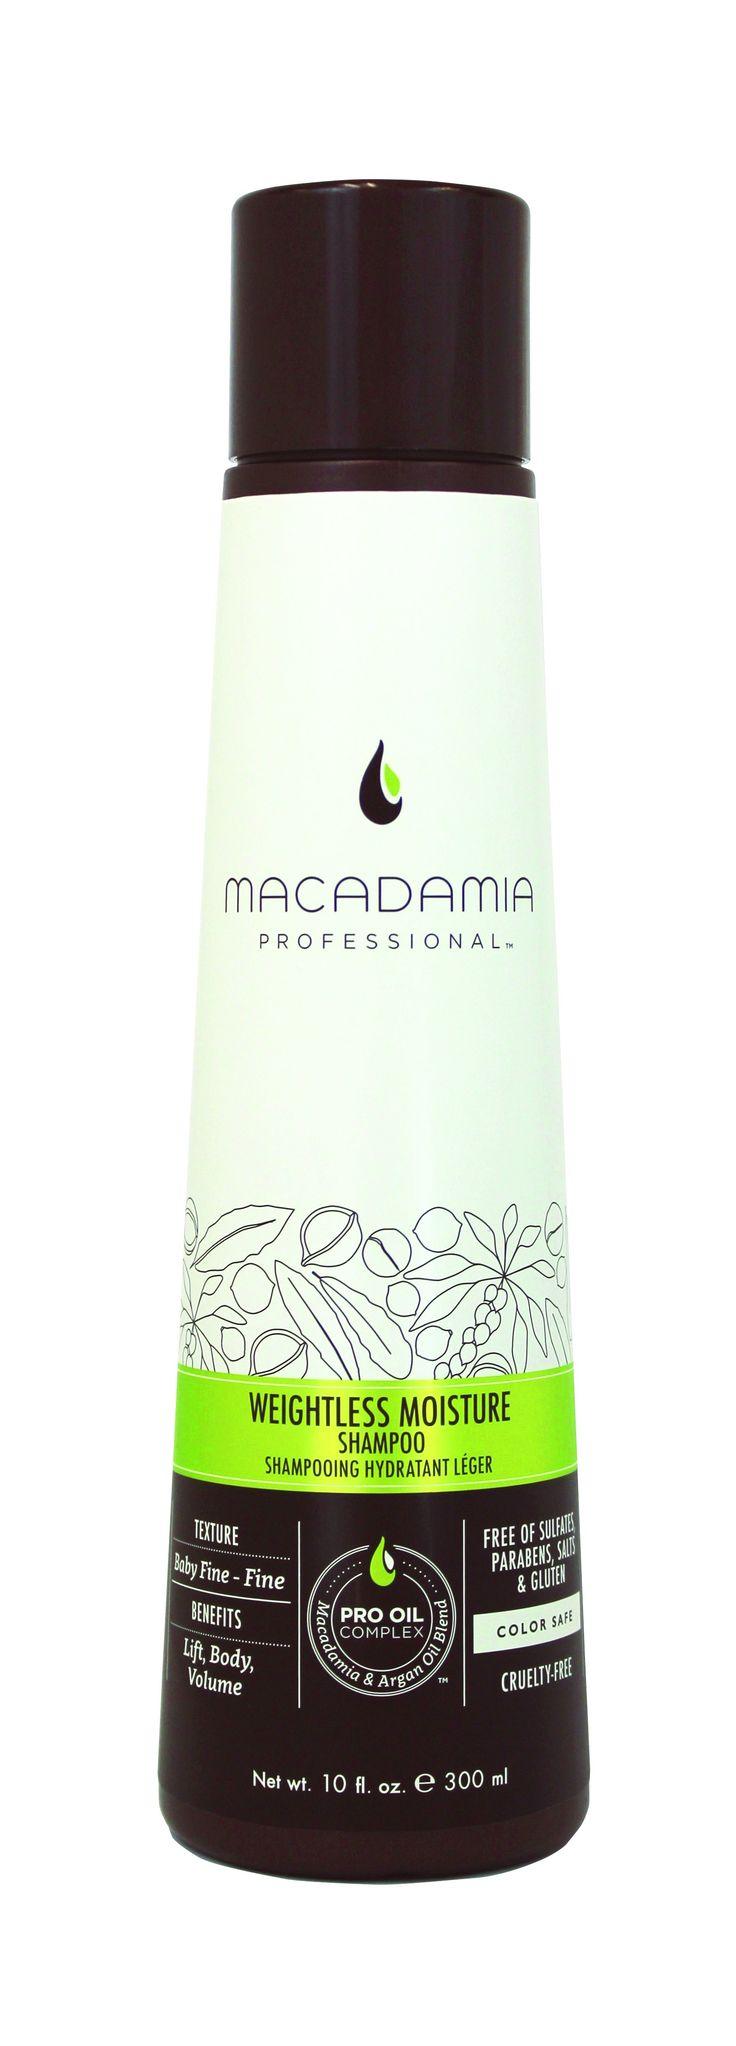 Macadamia Professional Weightless Moisture Shampoo 300ml.